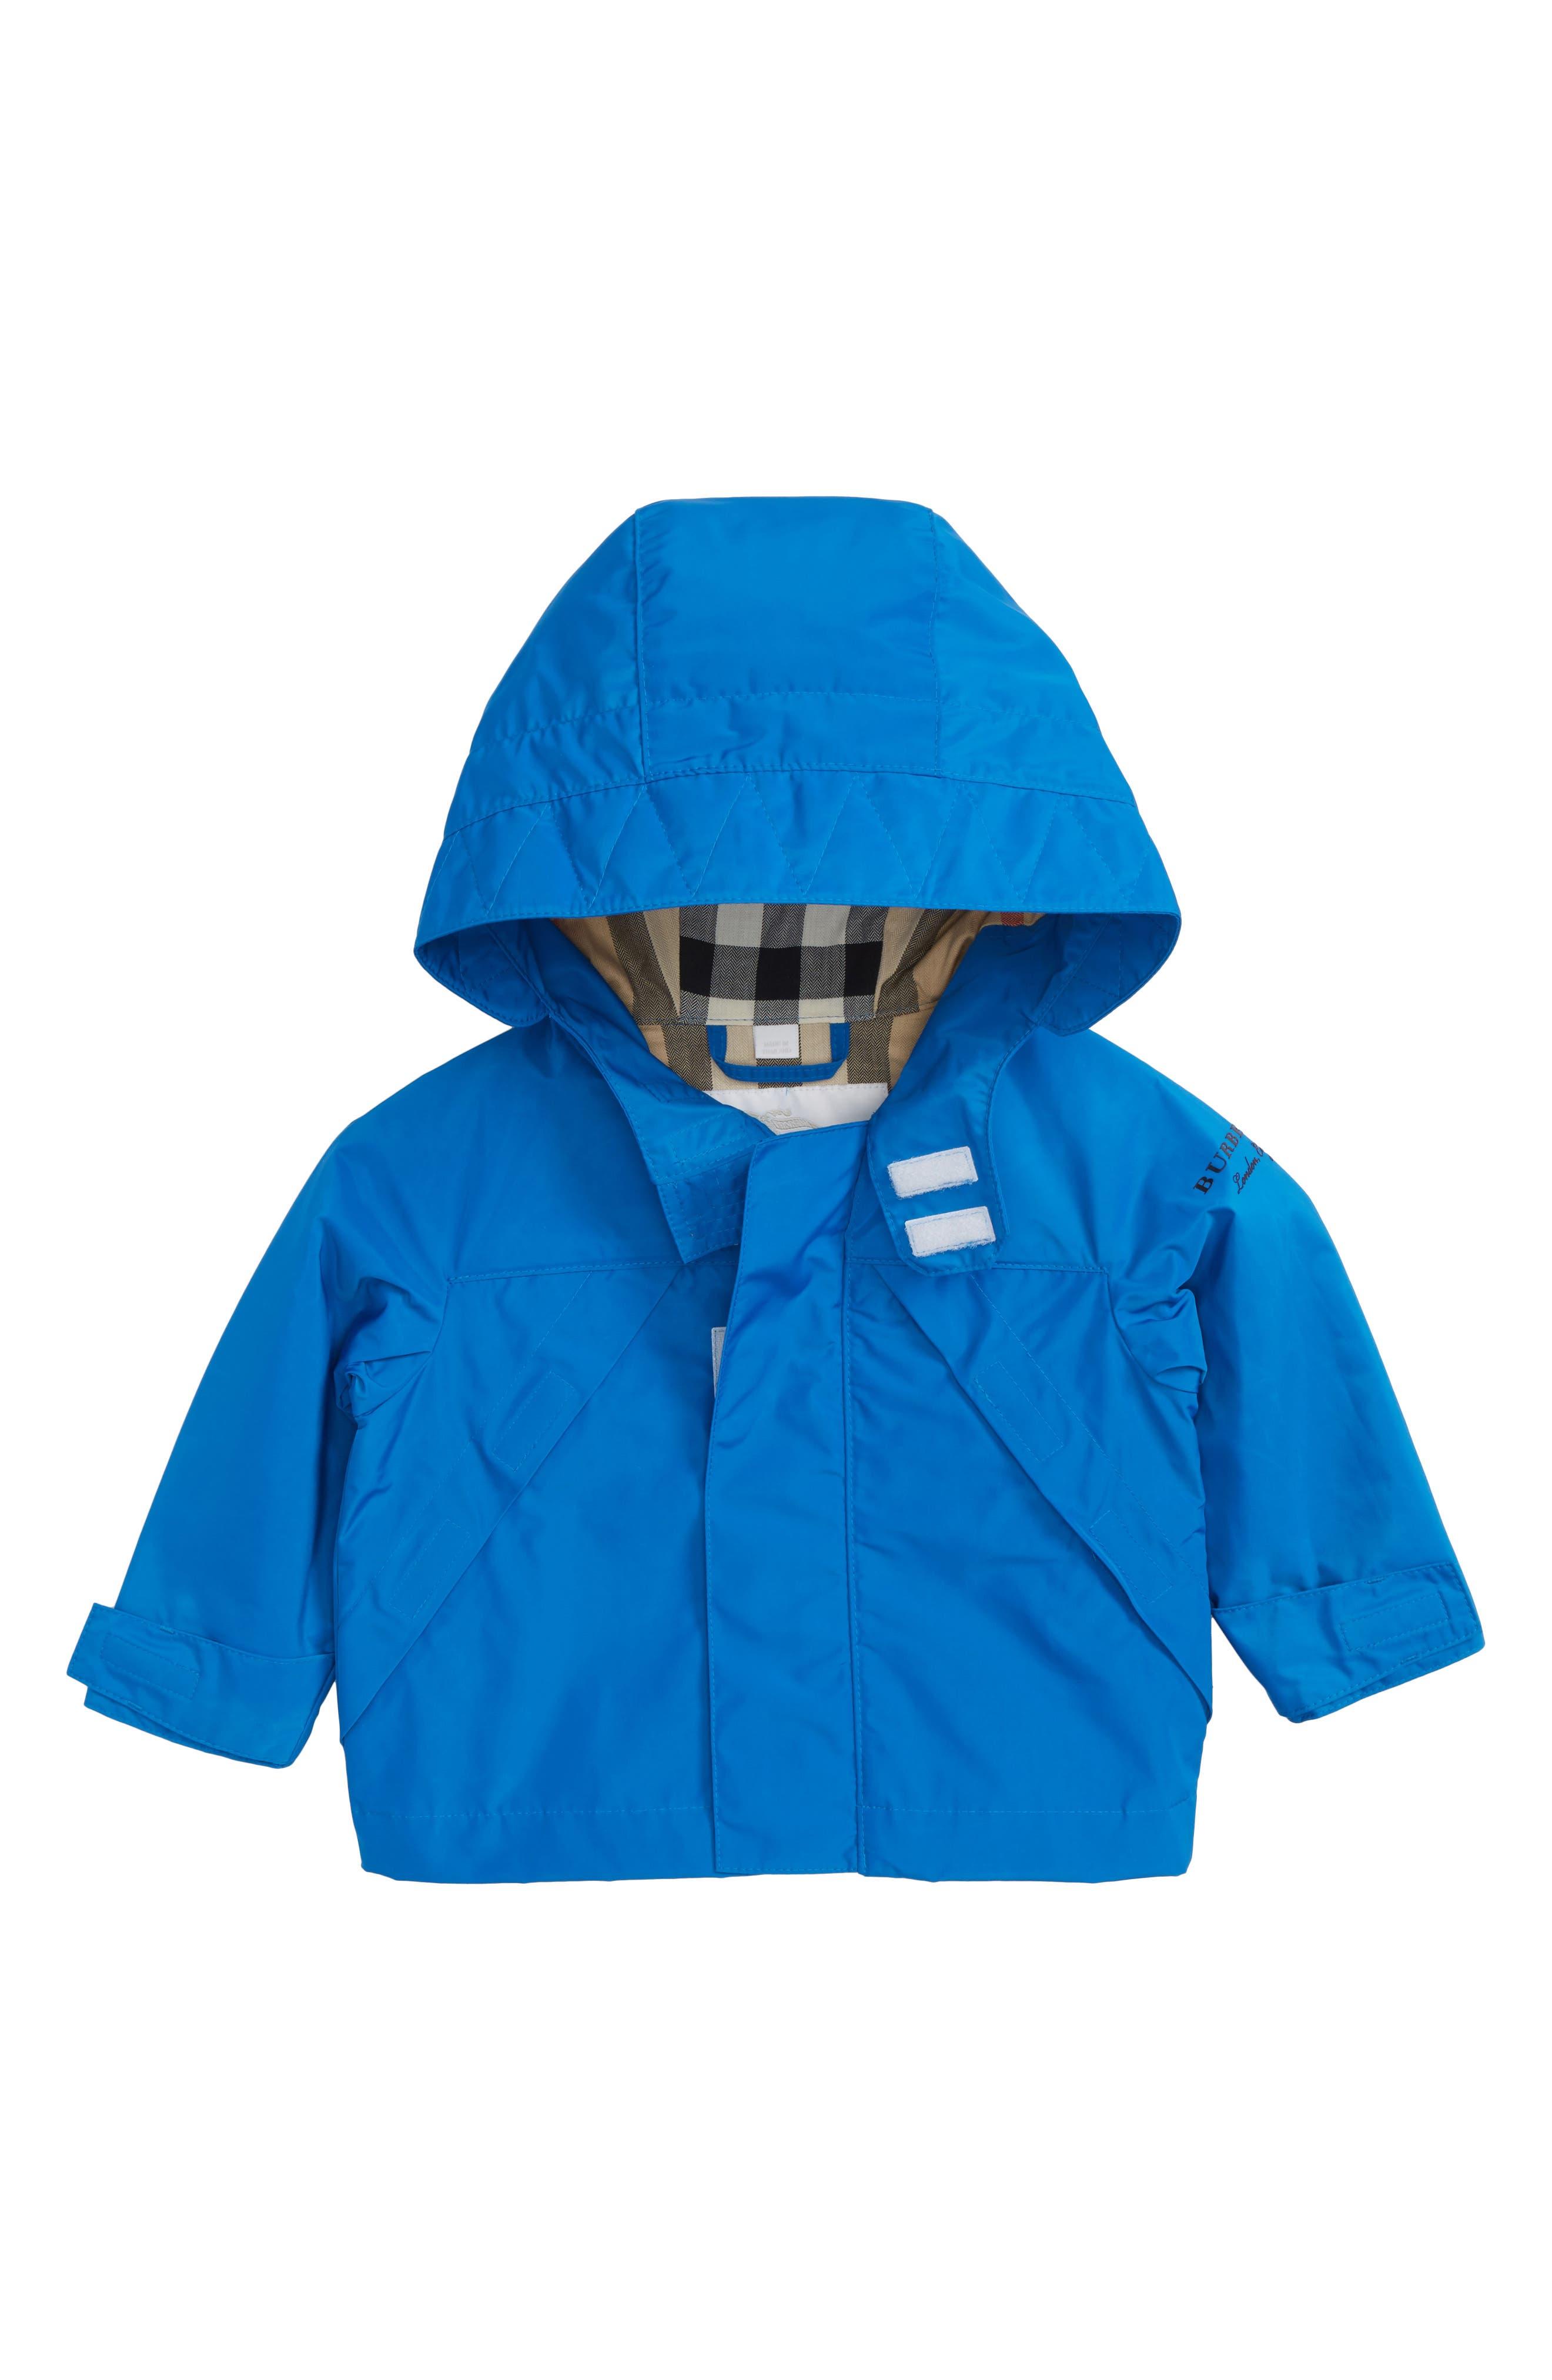 Yeoman Hooded Windbreaker Jacket,                         Main,                         color, 420